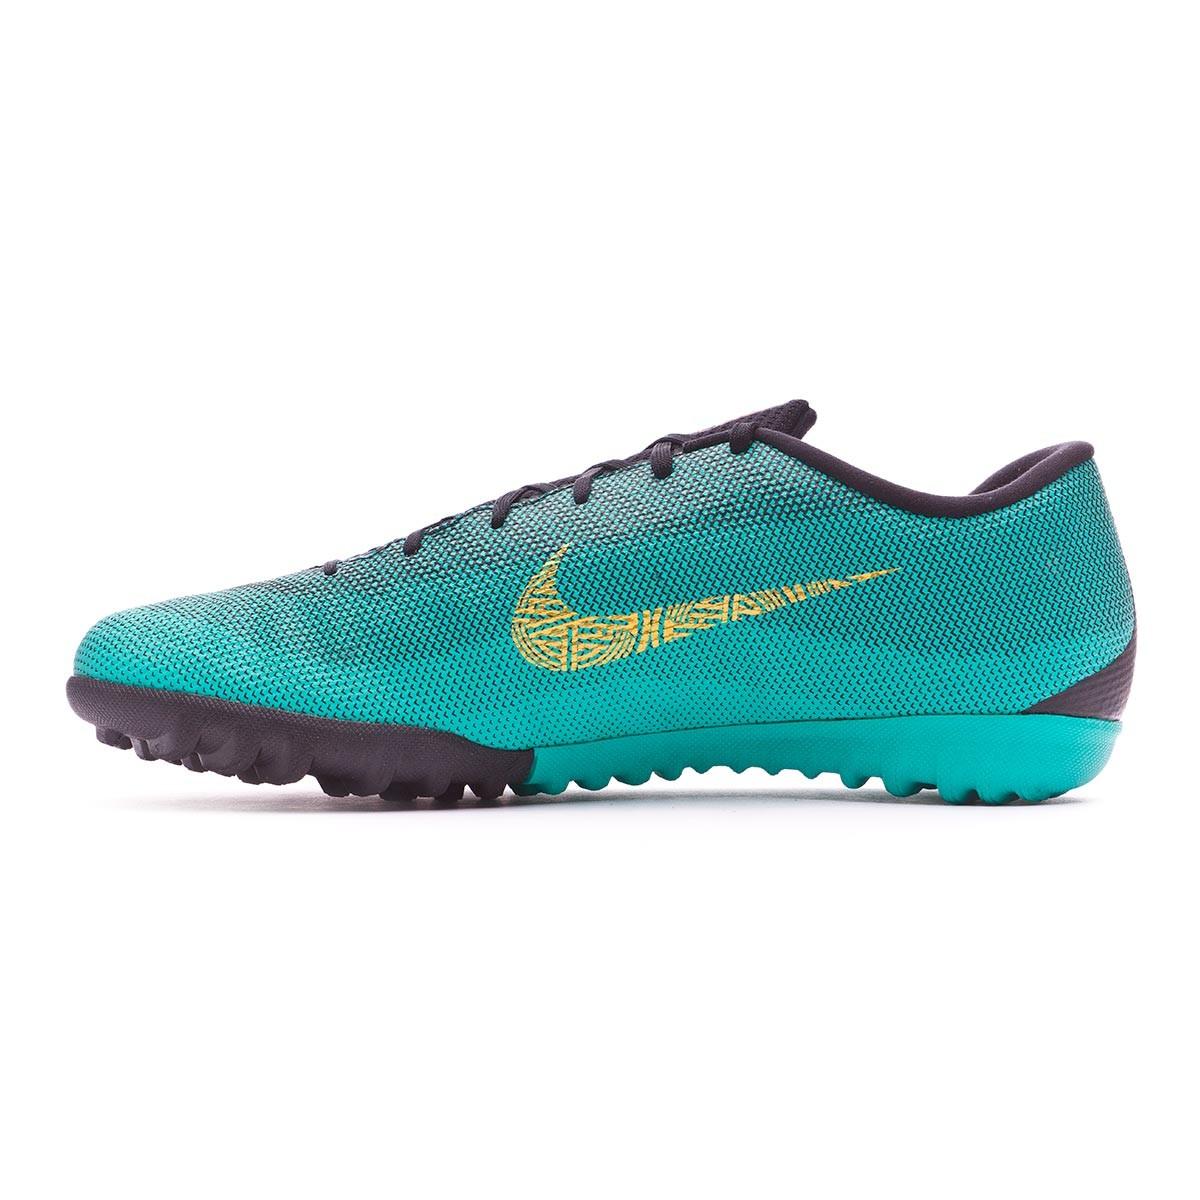 50c56a25d4d Football Boot Nike Mercurial VaporX XII Academy CR7 Turf Clear jade-Metallic  vivid gold-Black - Football store Fútbol Emotion